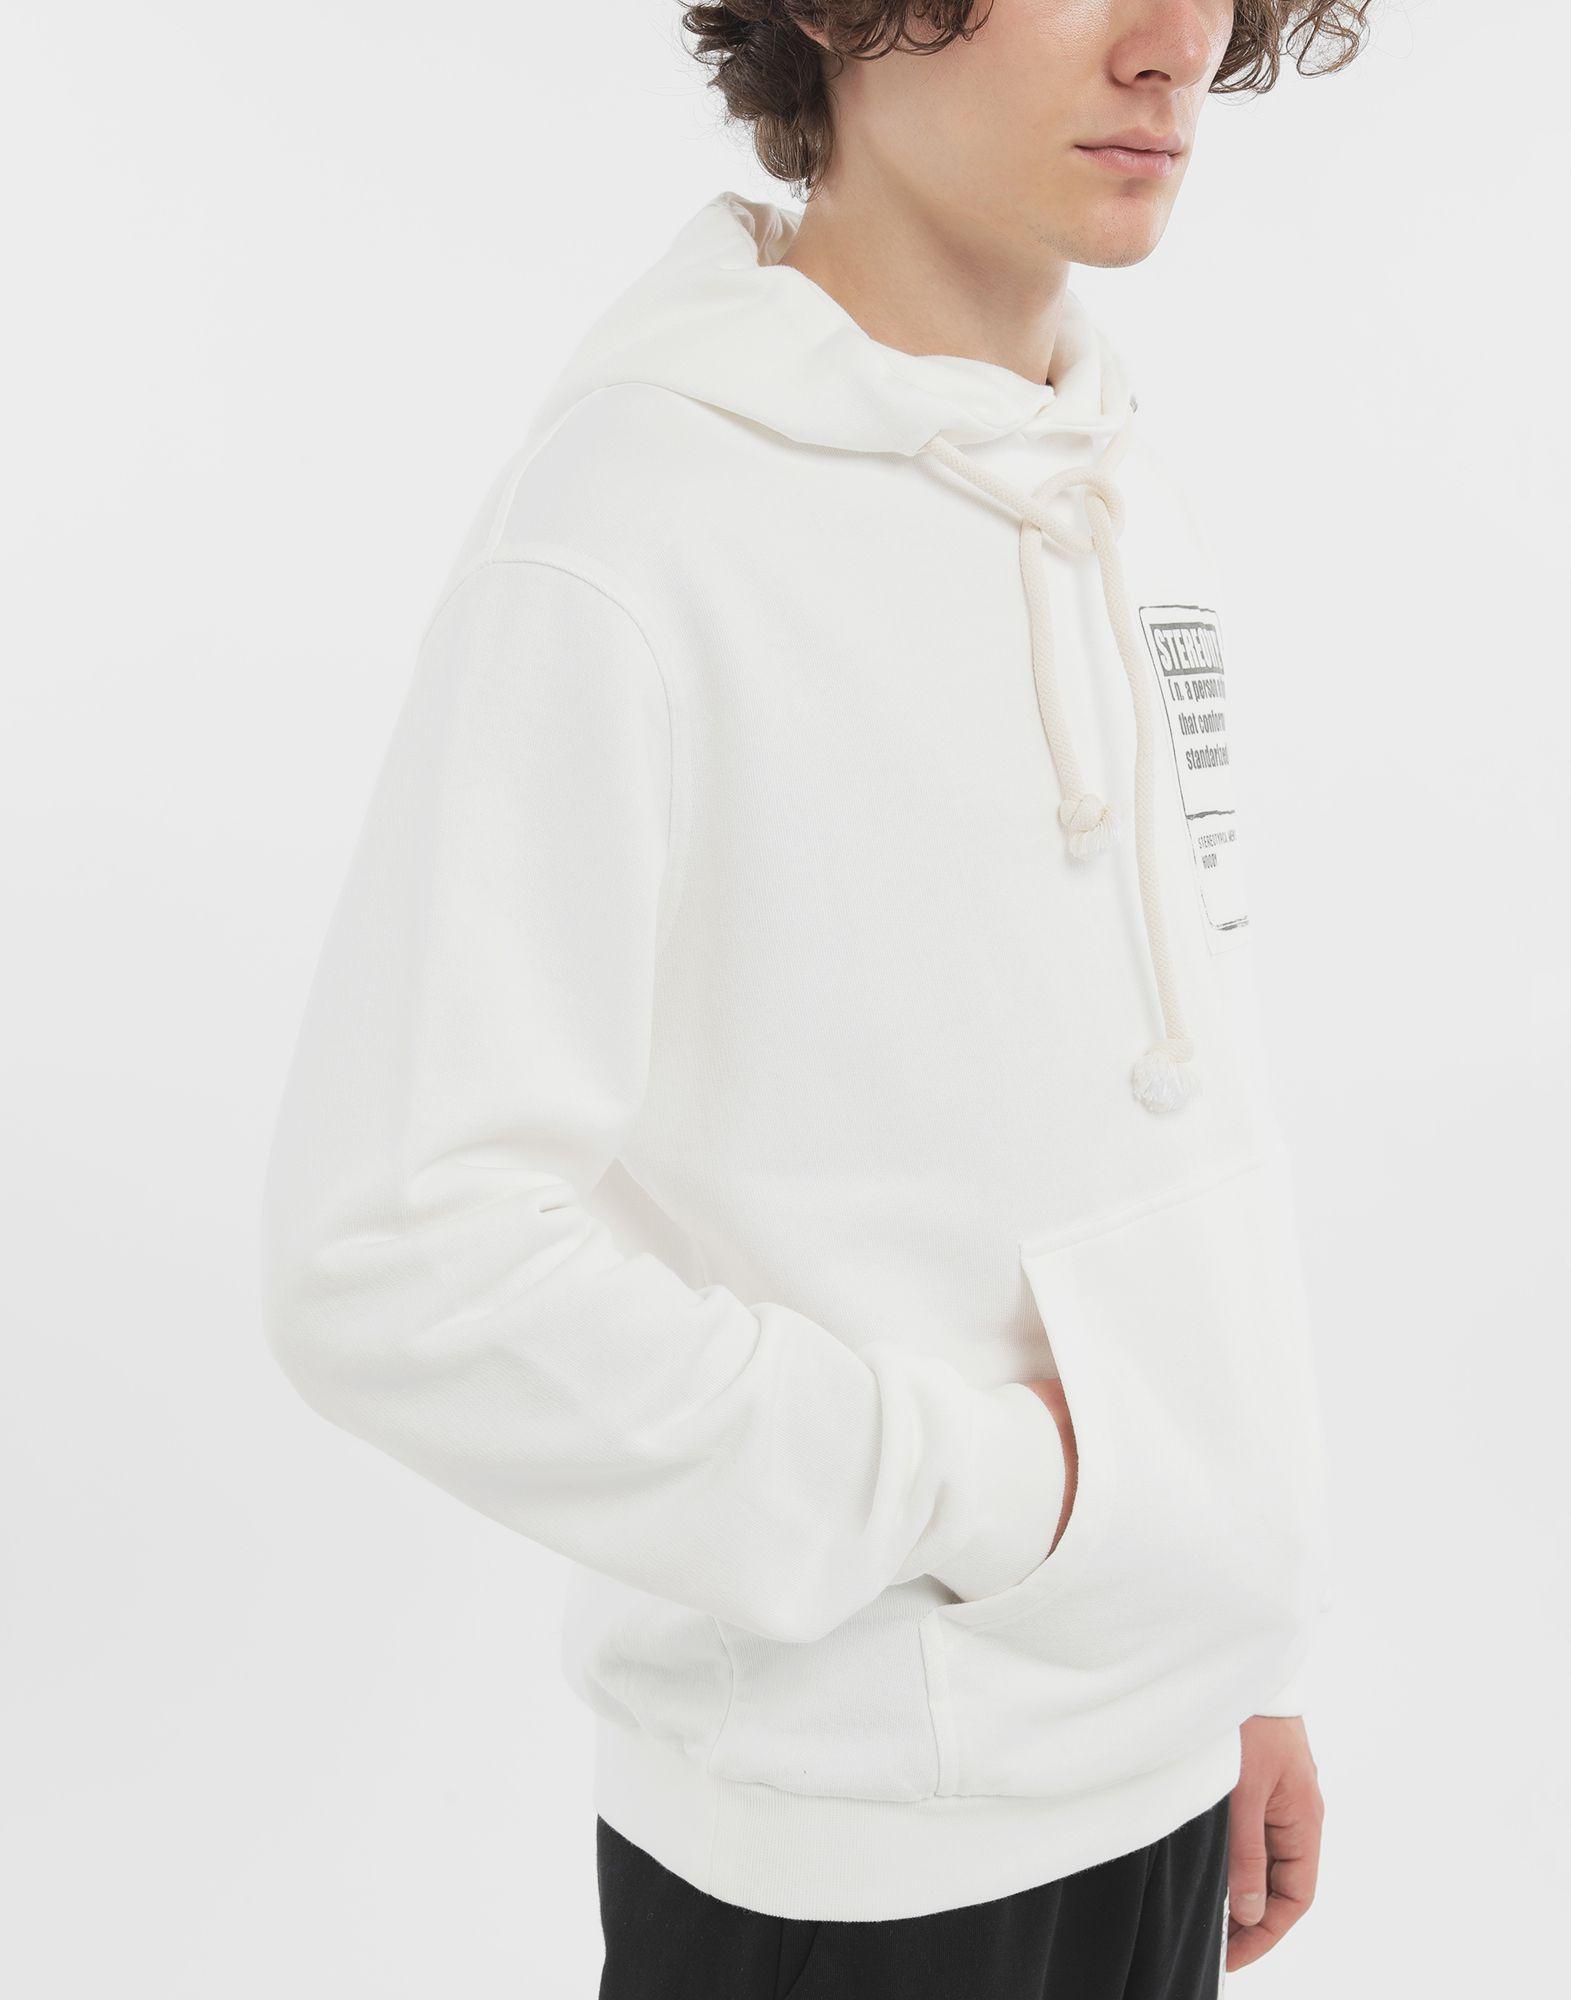 MAISON MARGIELA 'Stereotype' cotton sweatshirt Sweatshirt Man b